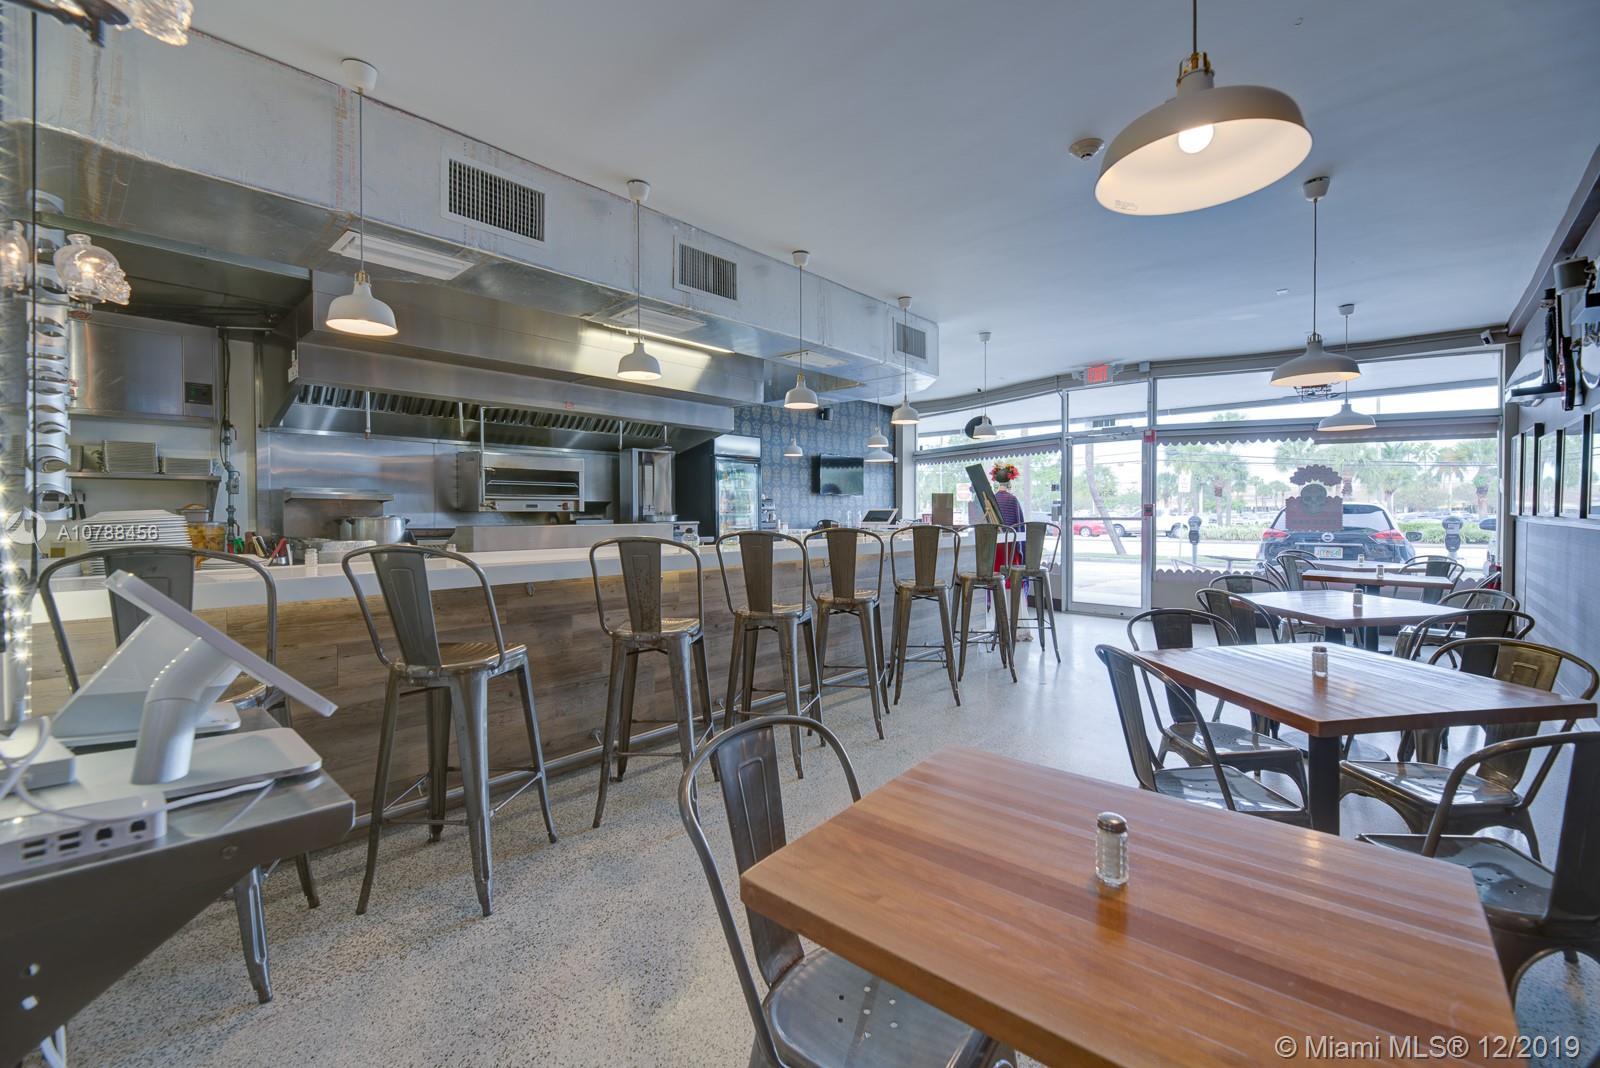 Restaurant of South Dixie Hwy., Oakland Park, FL 33306